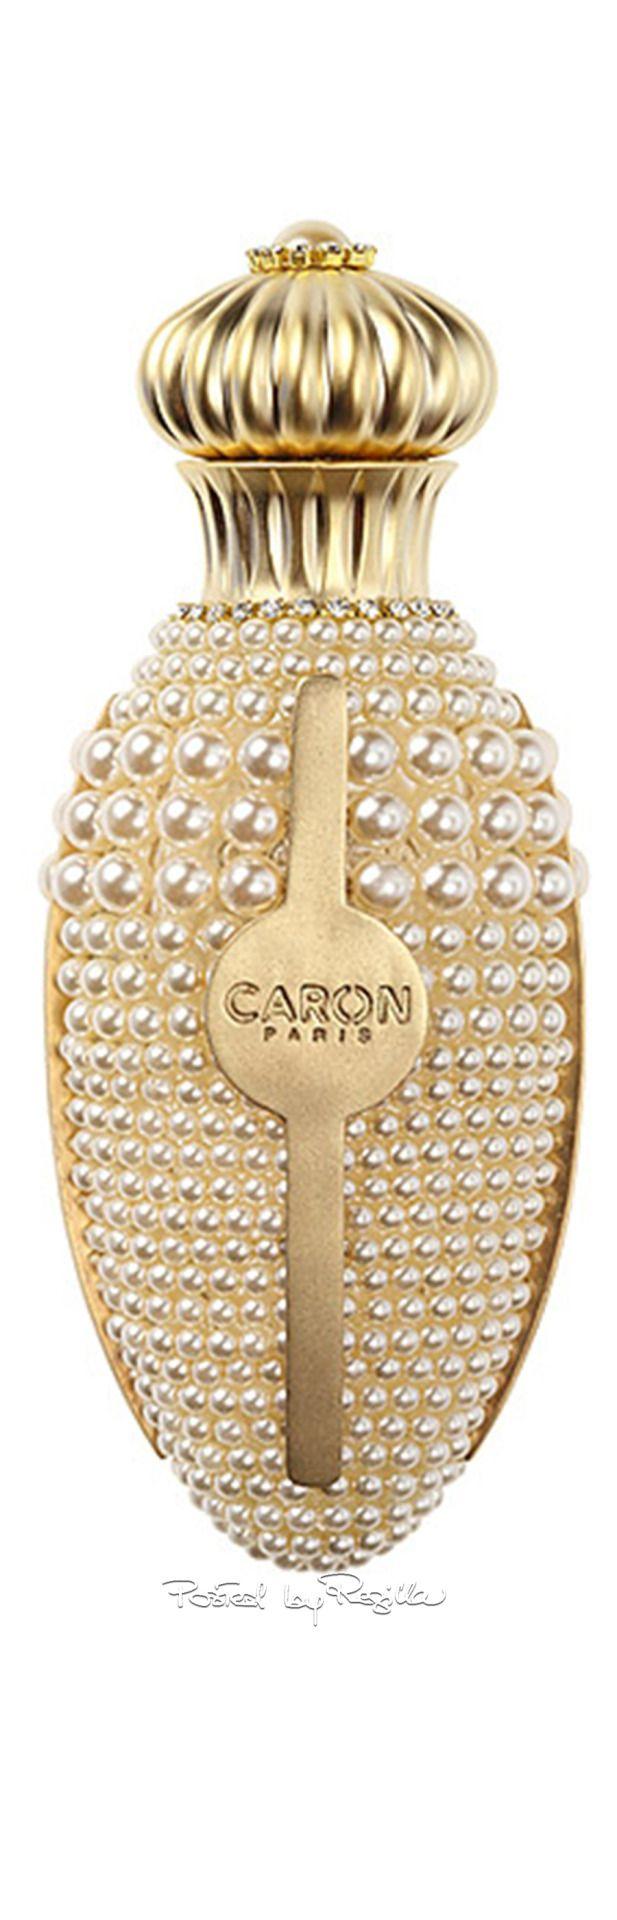 Regilla ⚜ Caron Luxury Fragrance - http://amzn.to/2iFOls8